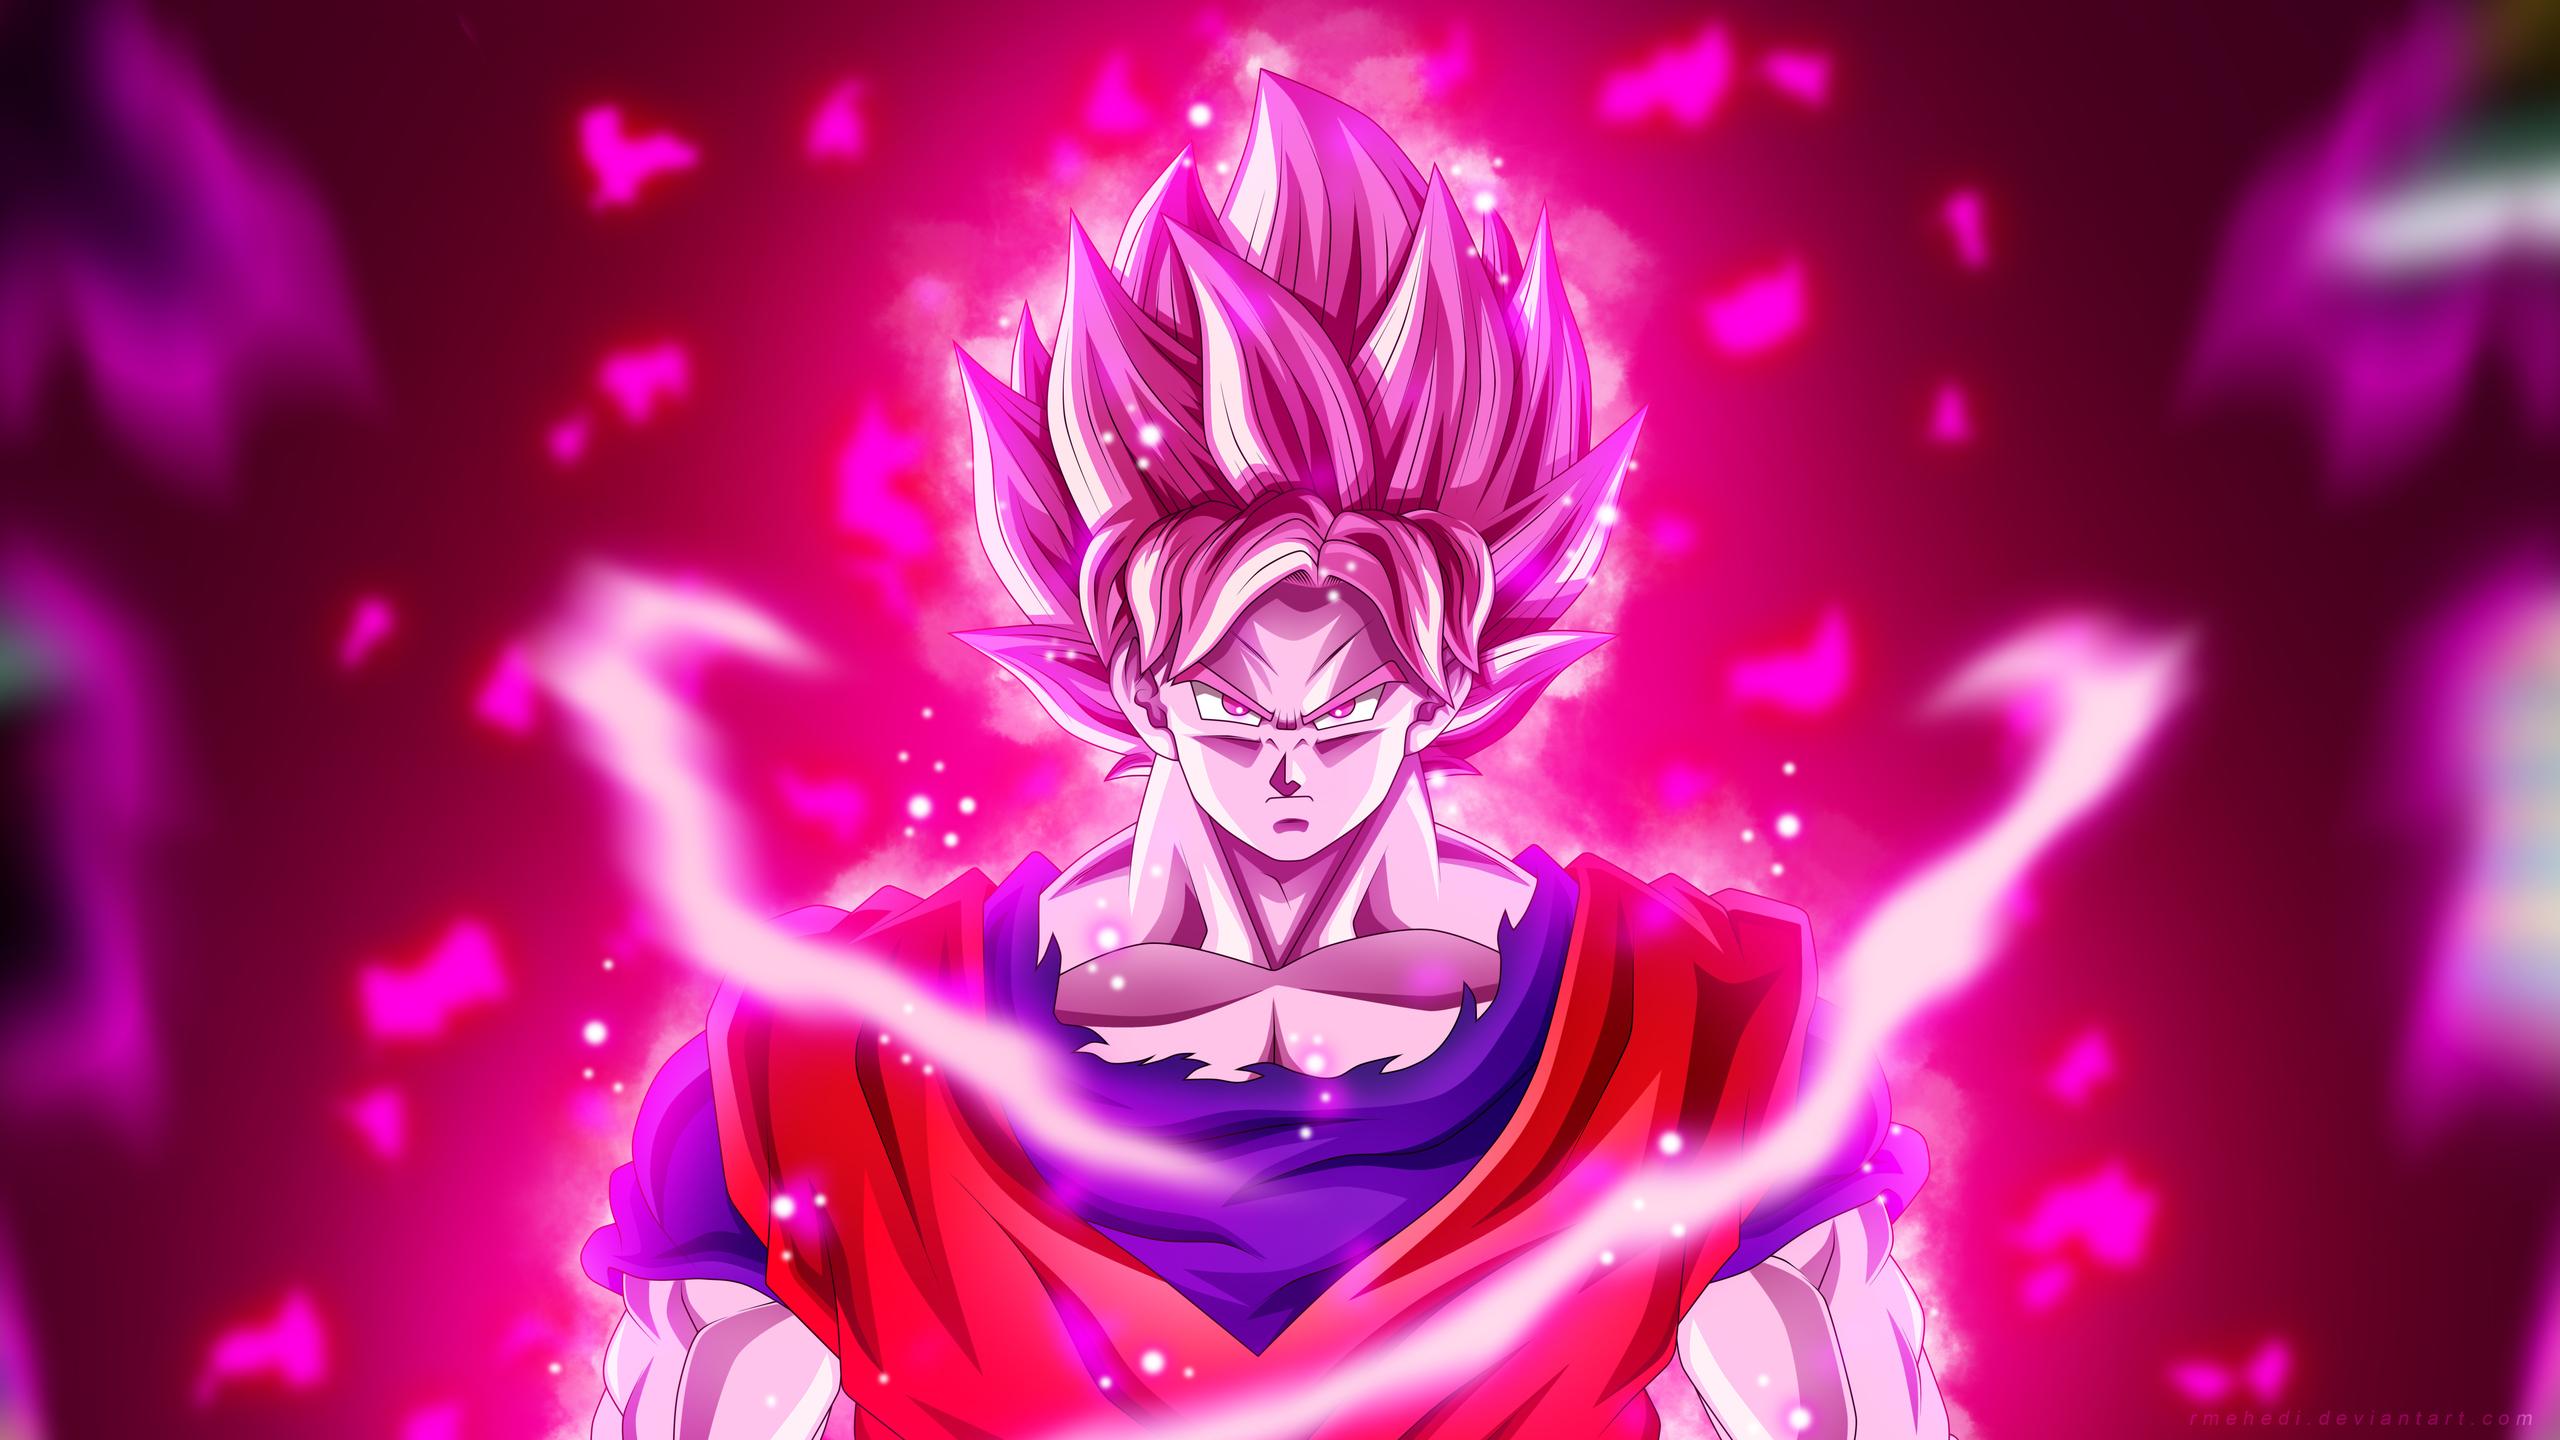 2560x1440 Goku Super Saiyan Blue Kaioken 5k 1440p Resolution Hd 4k